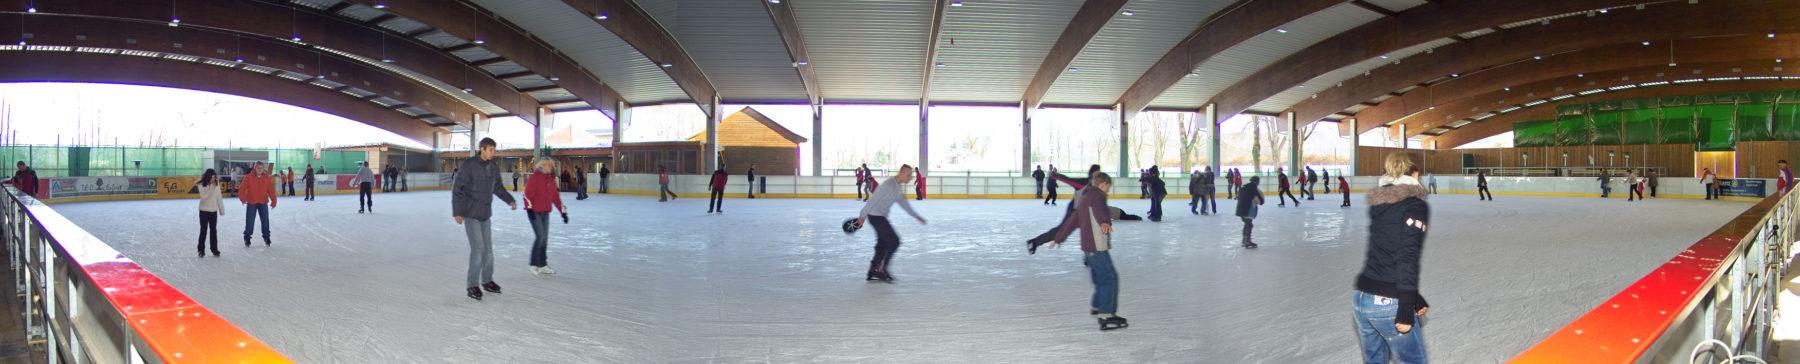 Panorama-Eisbahn-1